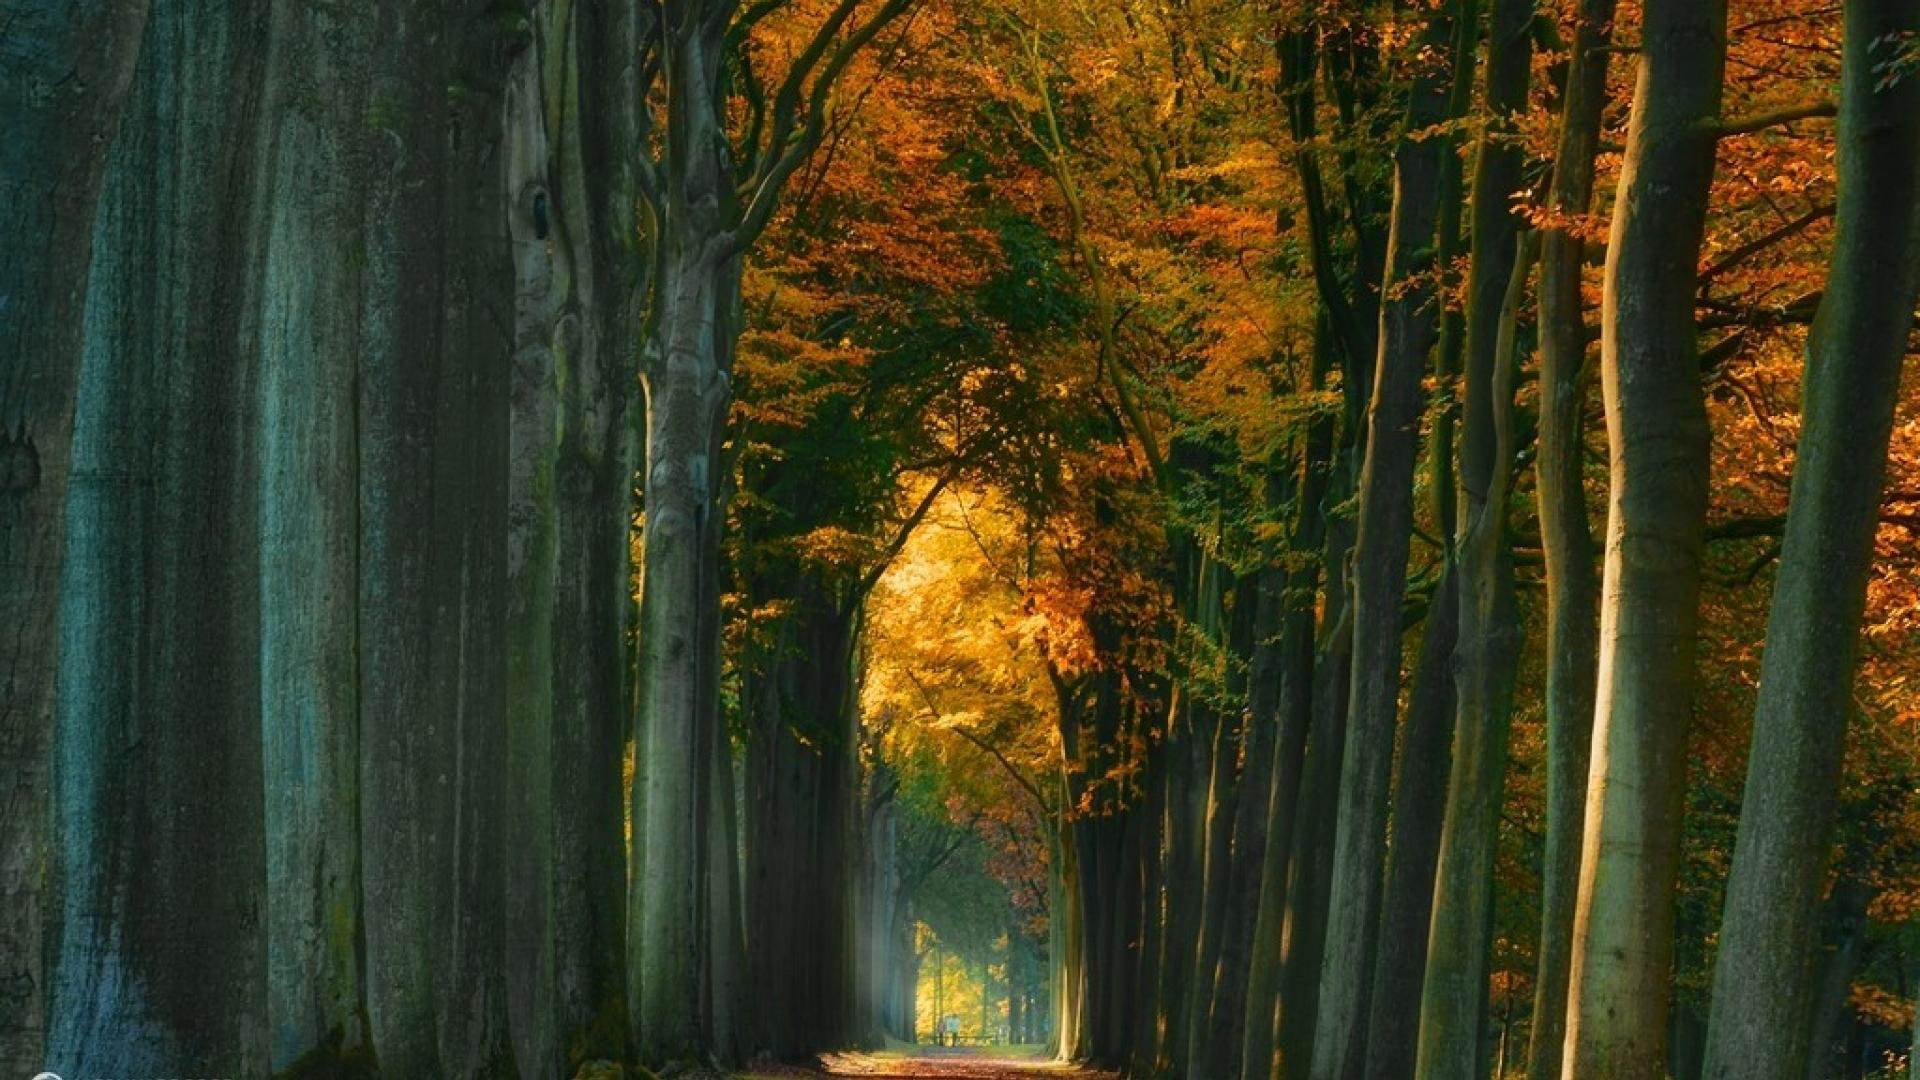 Fall Desktop Wallpaper 1920x1080 Landscape Nature Tree Forest Woods Autumn Road Path People